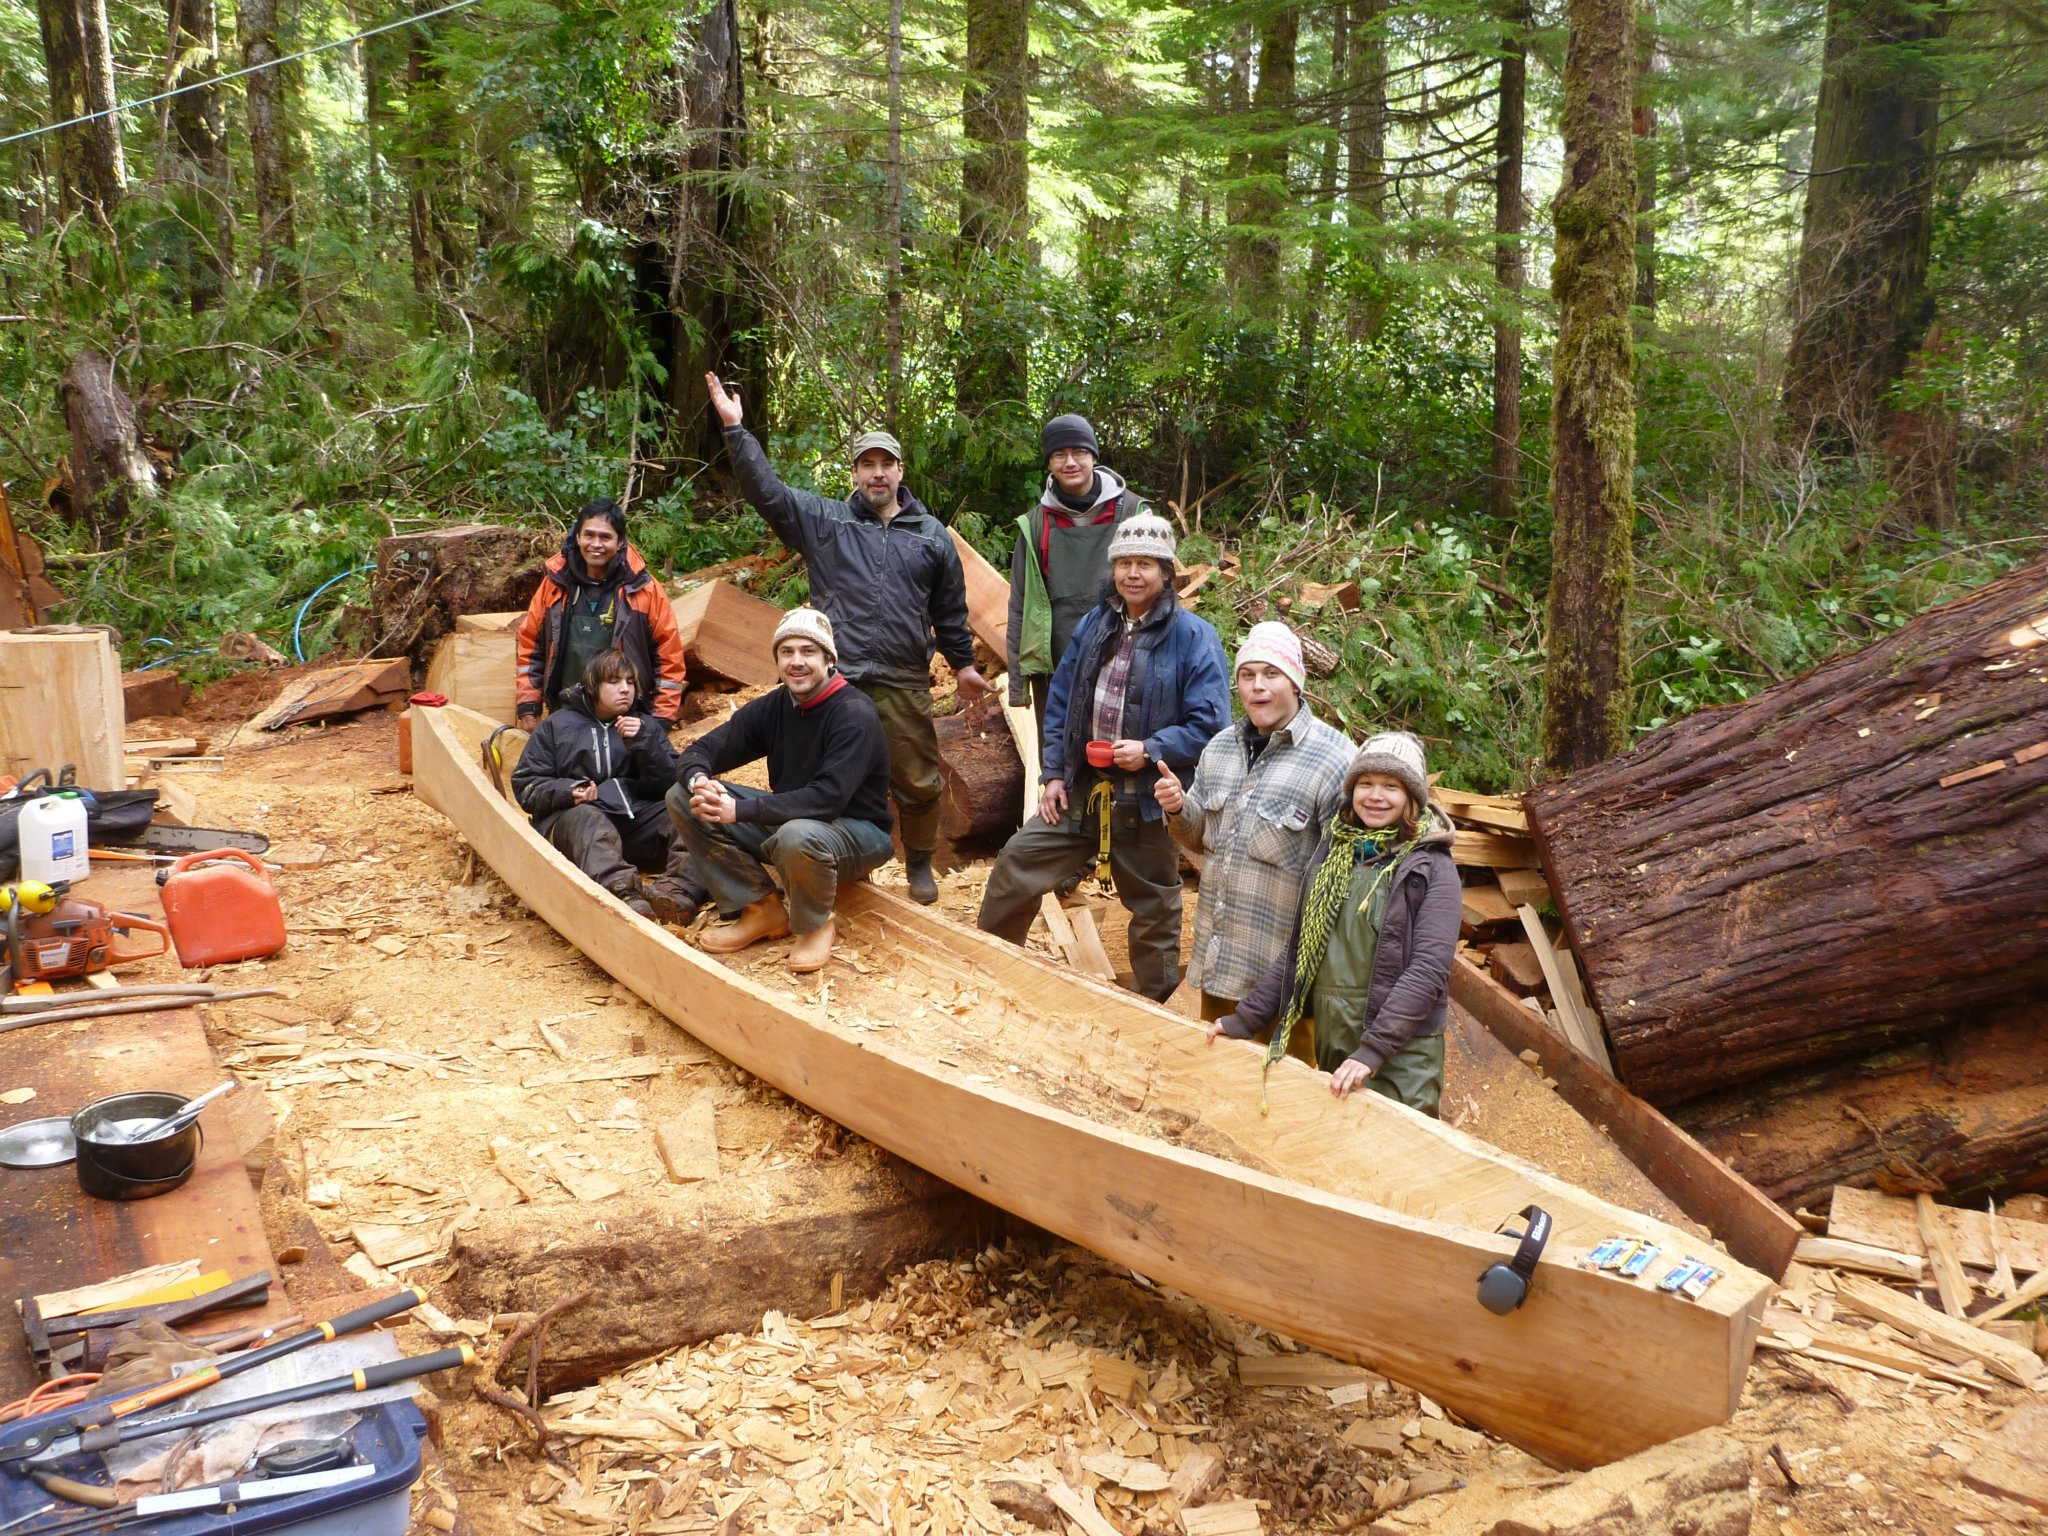 Photo: Joe Martin and assistants carving canoe ( Layla Čuucqa Rorick).